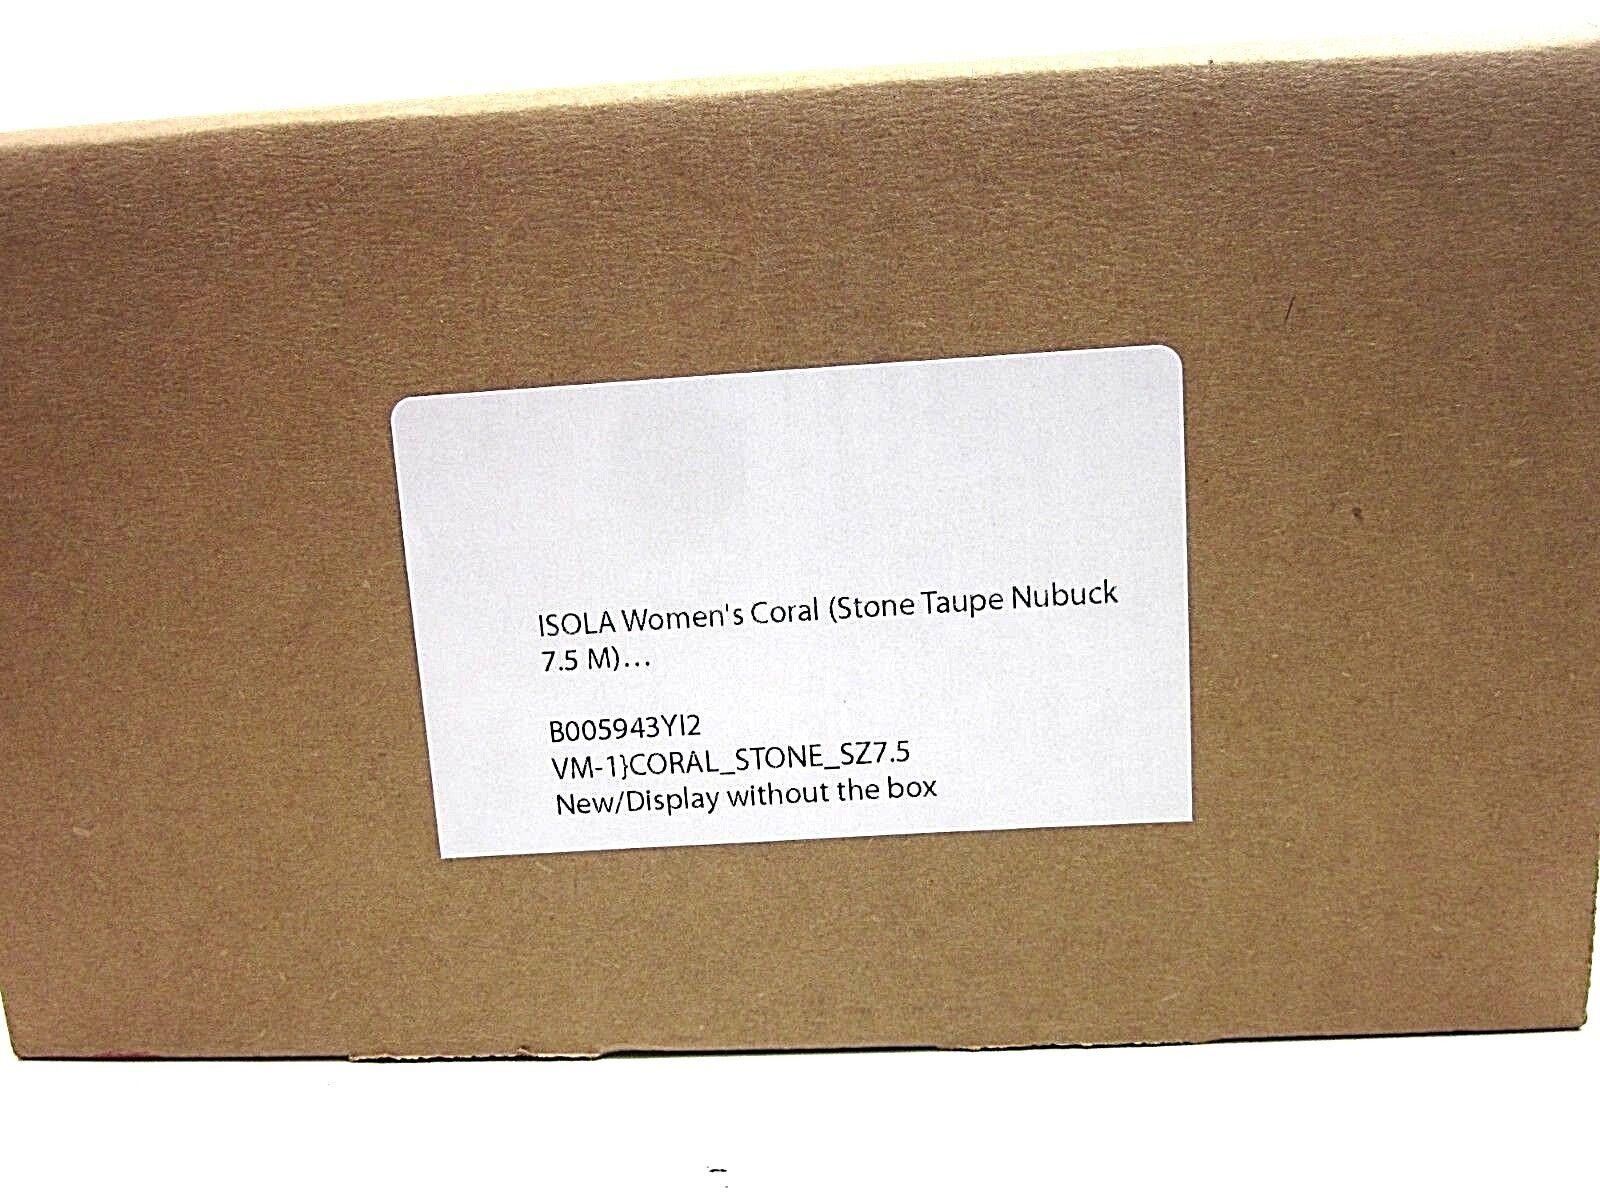 ISOLA CORAL PUMP damen STONE TAUPE NUBUCK 7.5M US Größe 7.5M NUBUCK NEW WITHOUT BOX f68d72